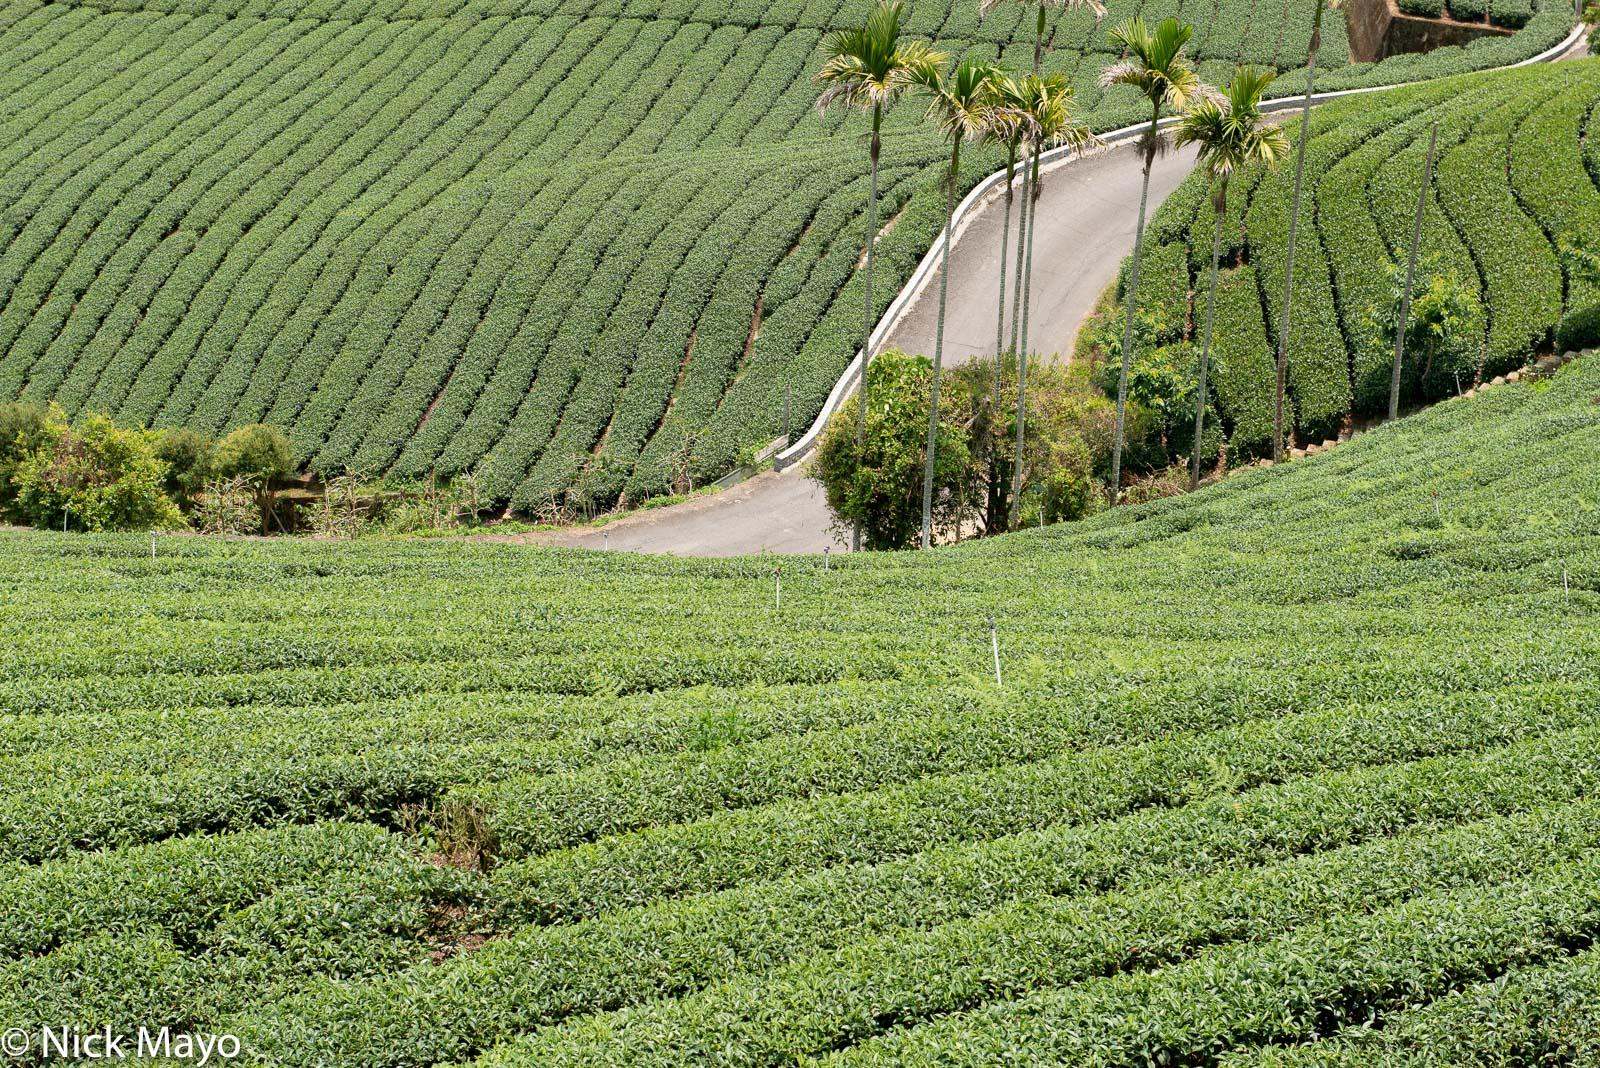 Tea fields at Bihushan in Chiayi County.